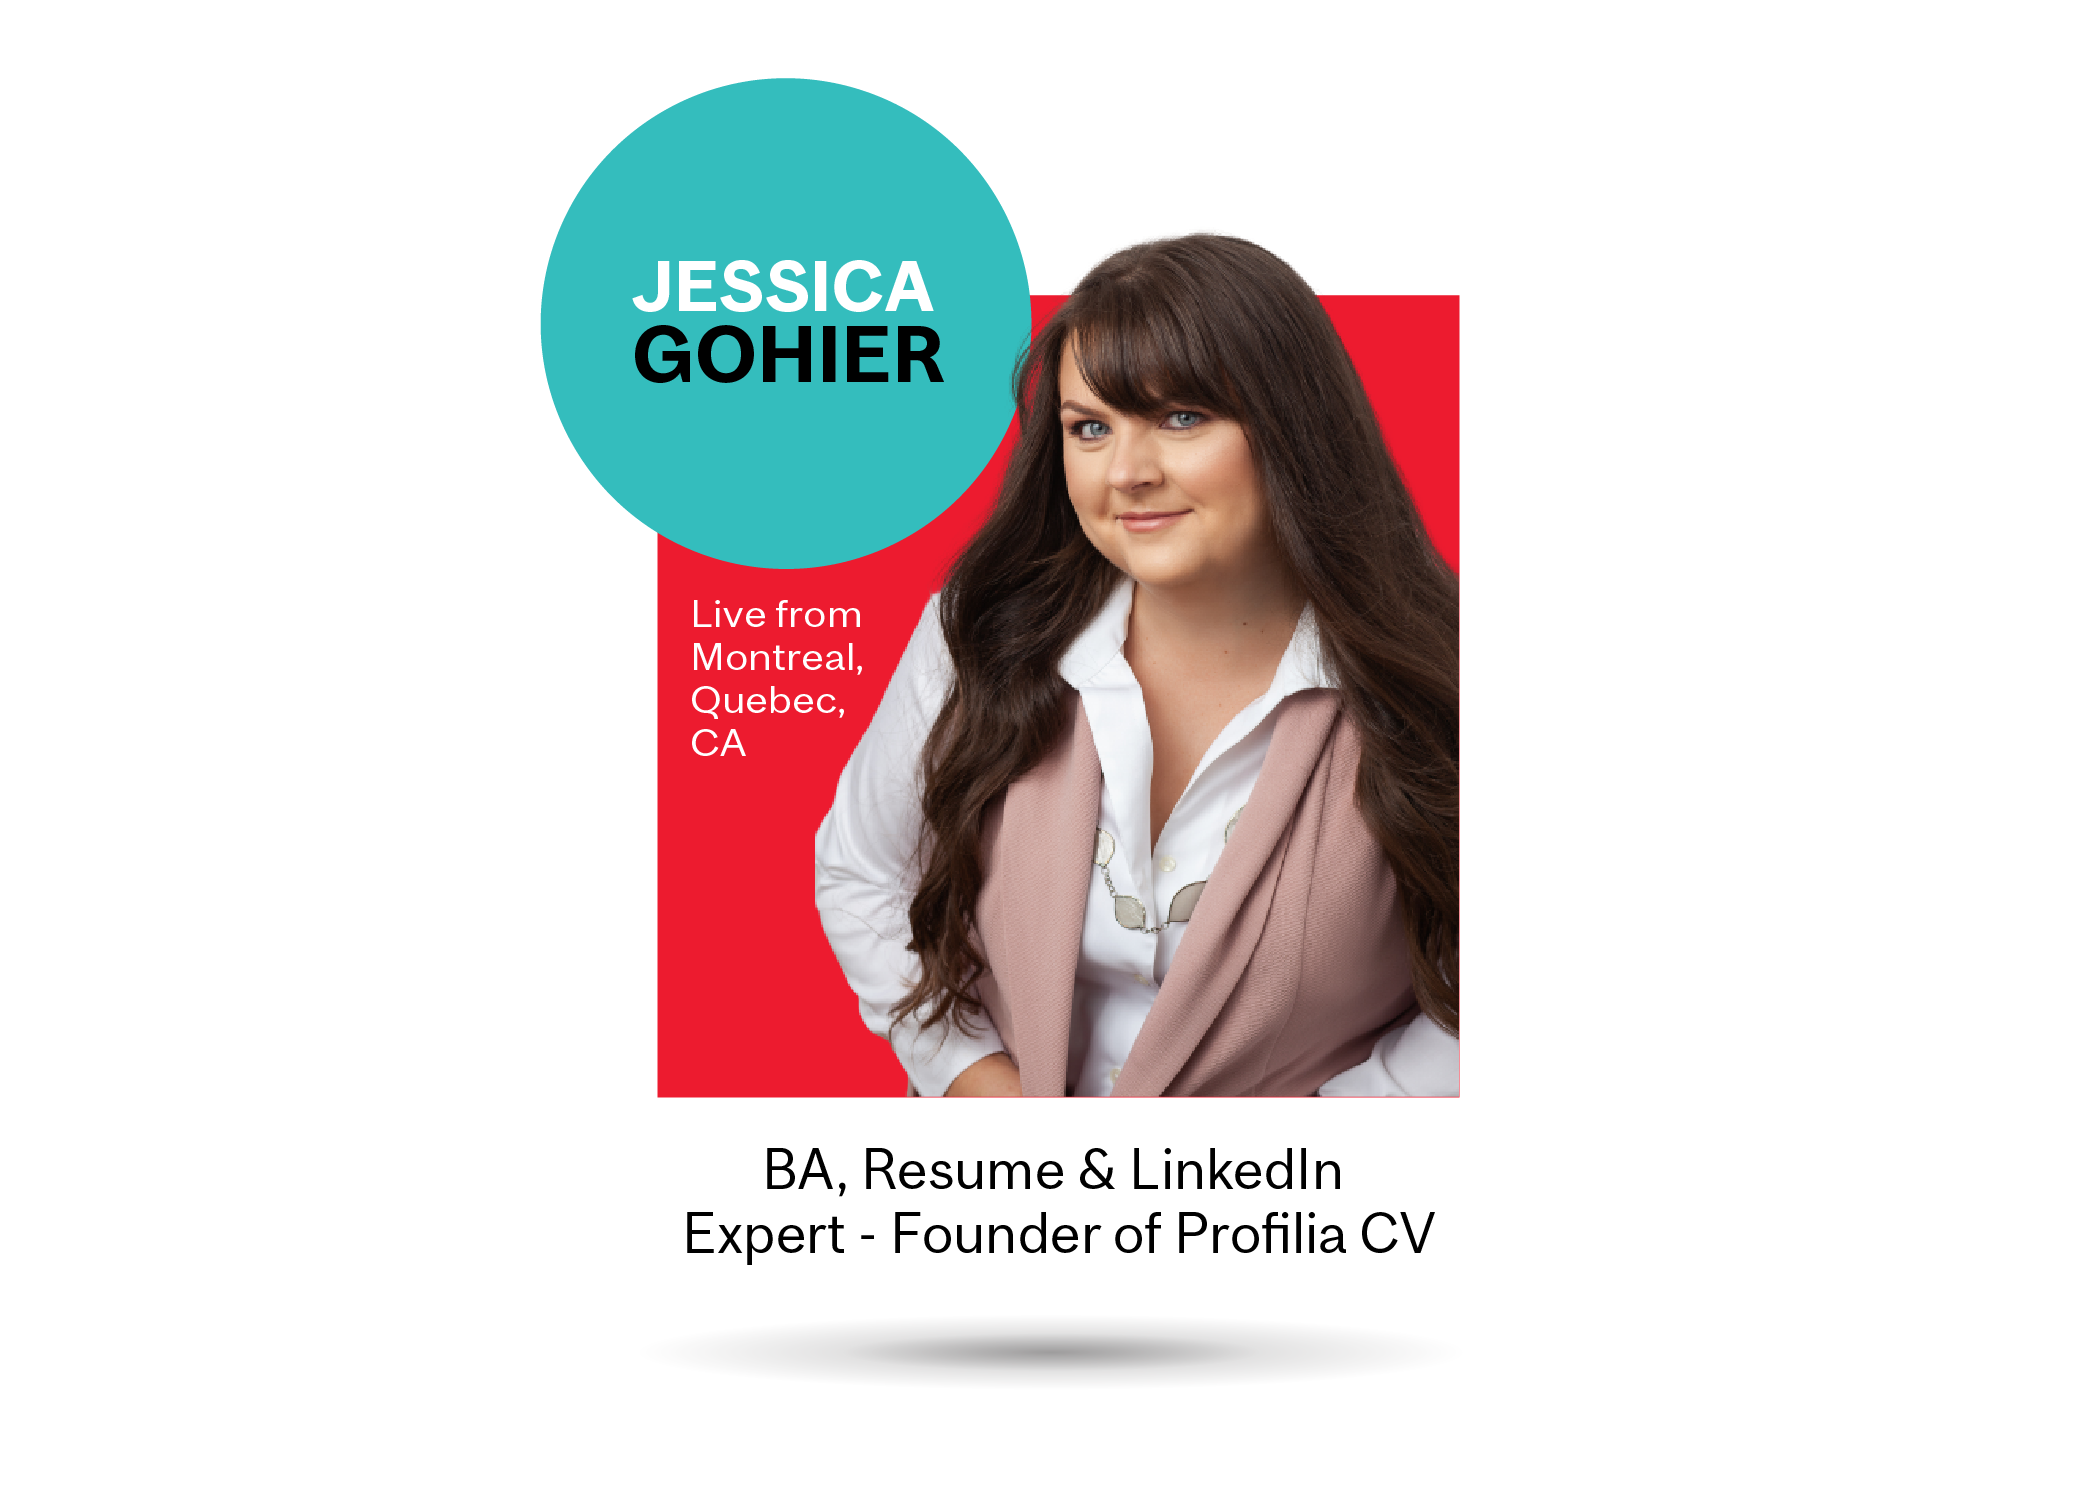 Jessica Gohier